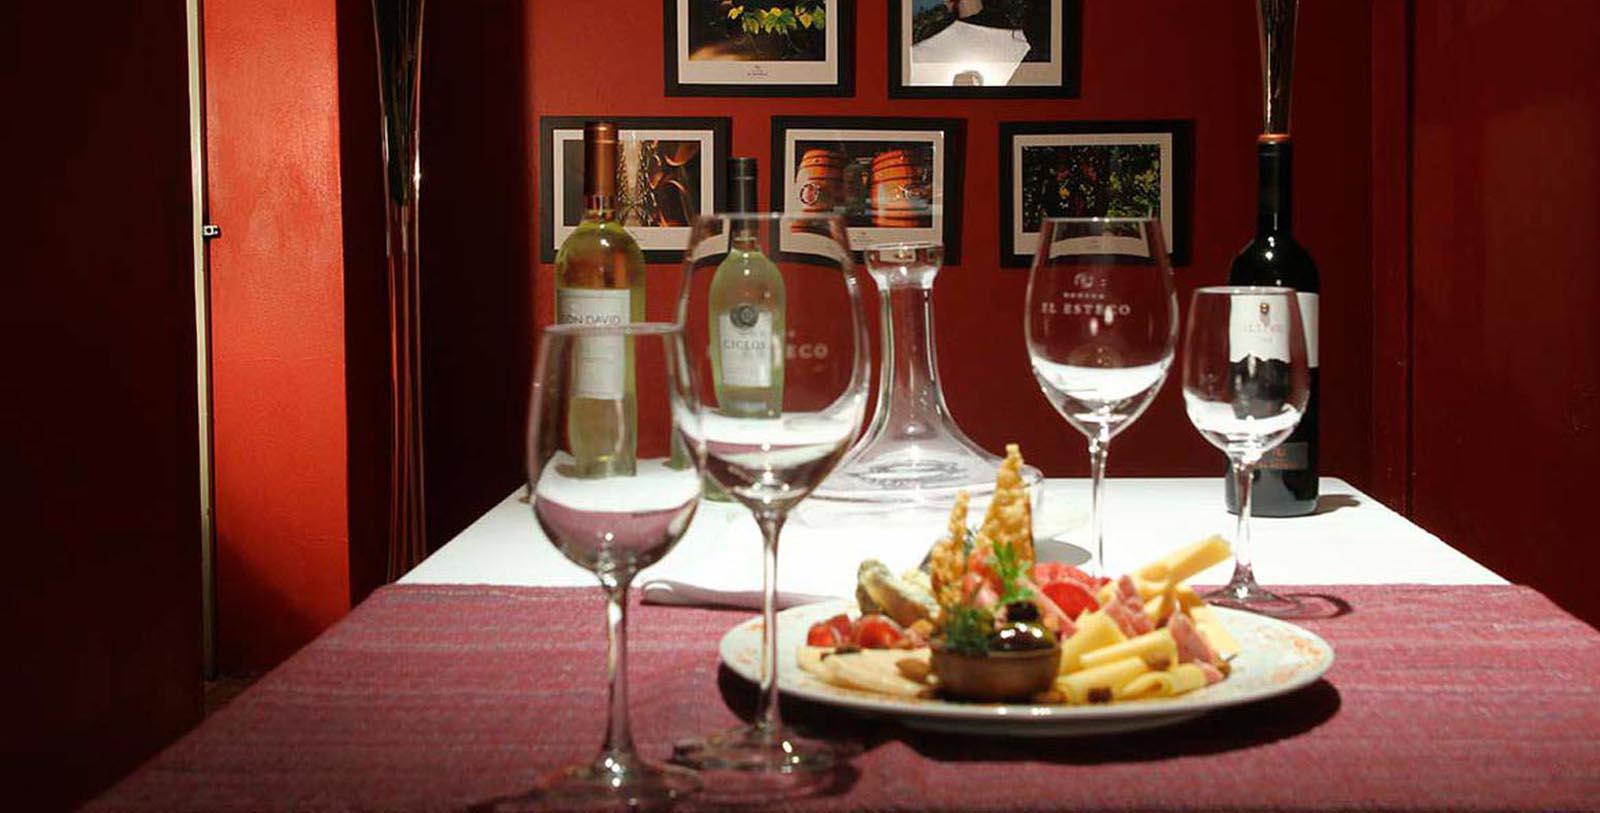 Image of Wine and Entree Patios de Cafayate, 1740, Member of Historic Hotels Worldwide, in Cafayate, Argentina, Taste